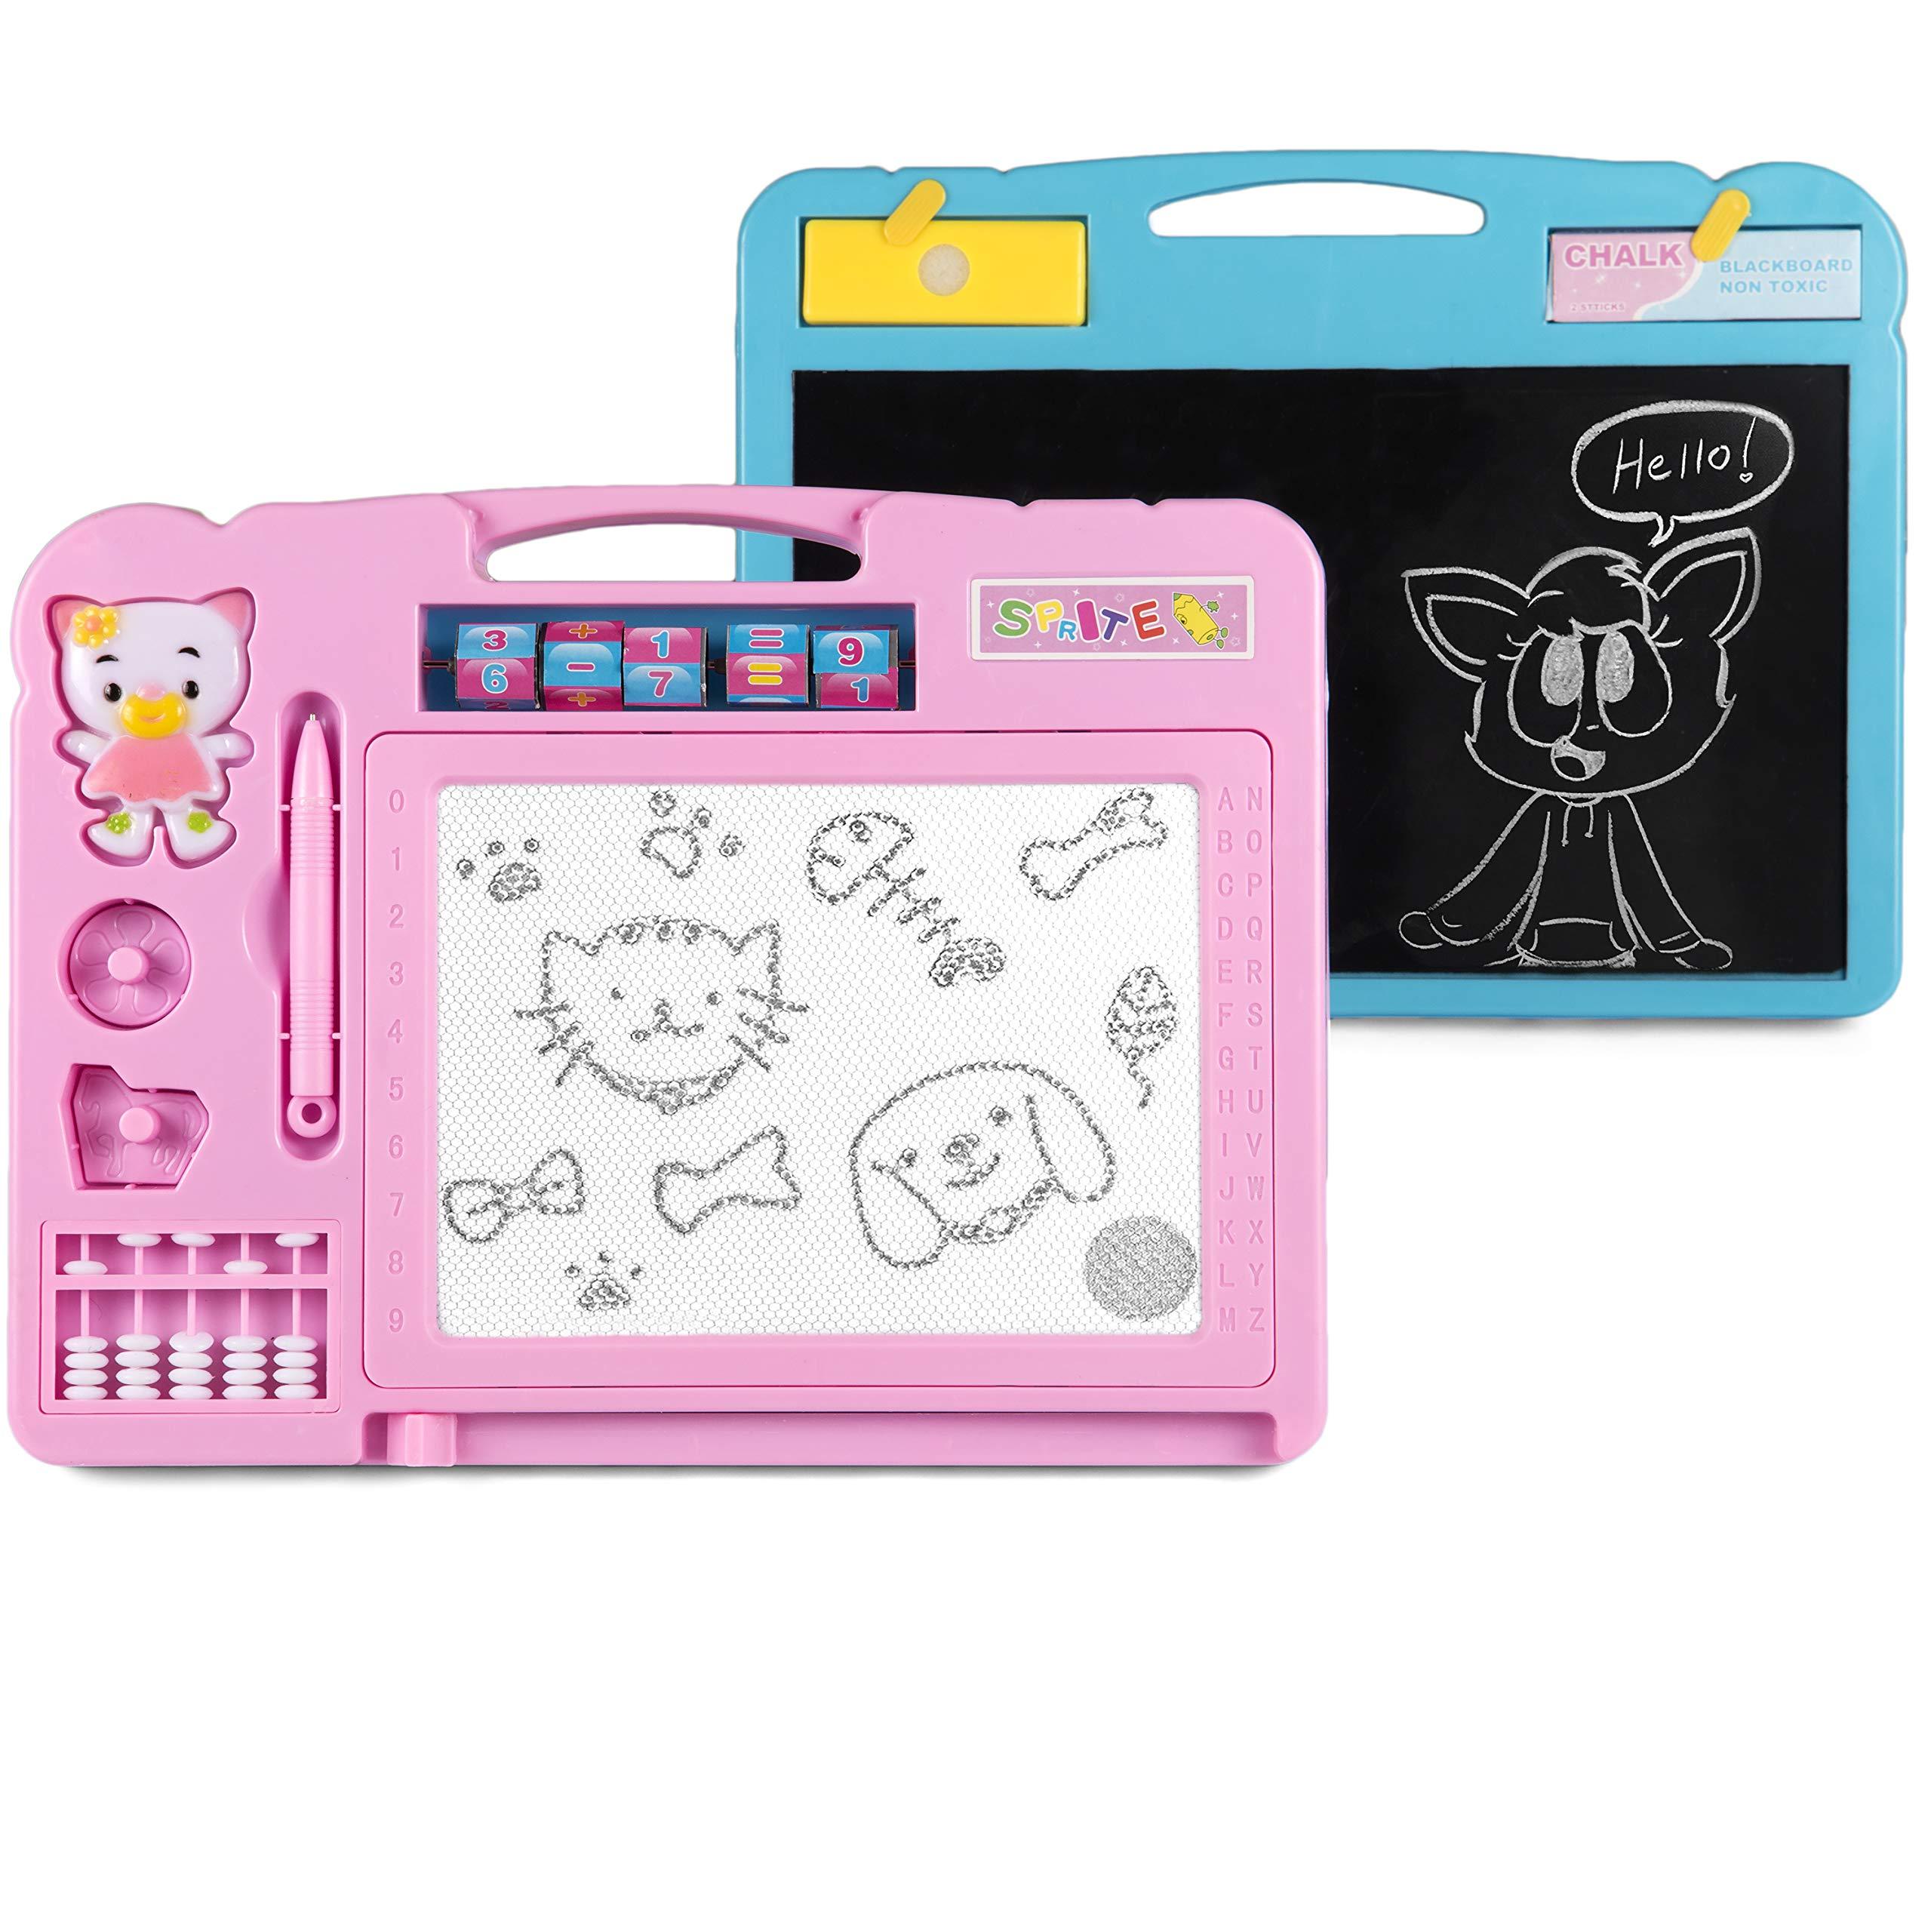 KIDSMARTER 2 in 1 Magnetic Drawing Board + Blackboard for Kids | Erasable Magnetic Doodle Board | Educational Doodle Board for Drawing and Writing | Toddler Doodle Board with Lovely Stamps, Pink